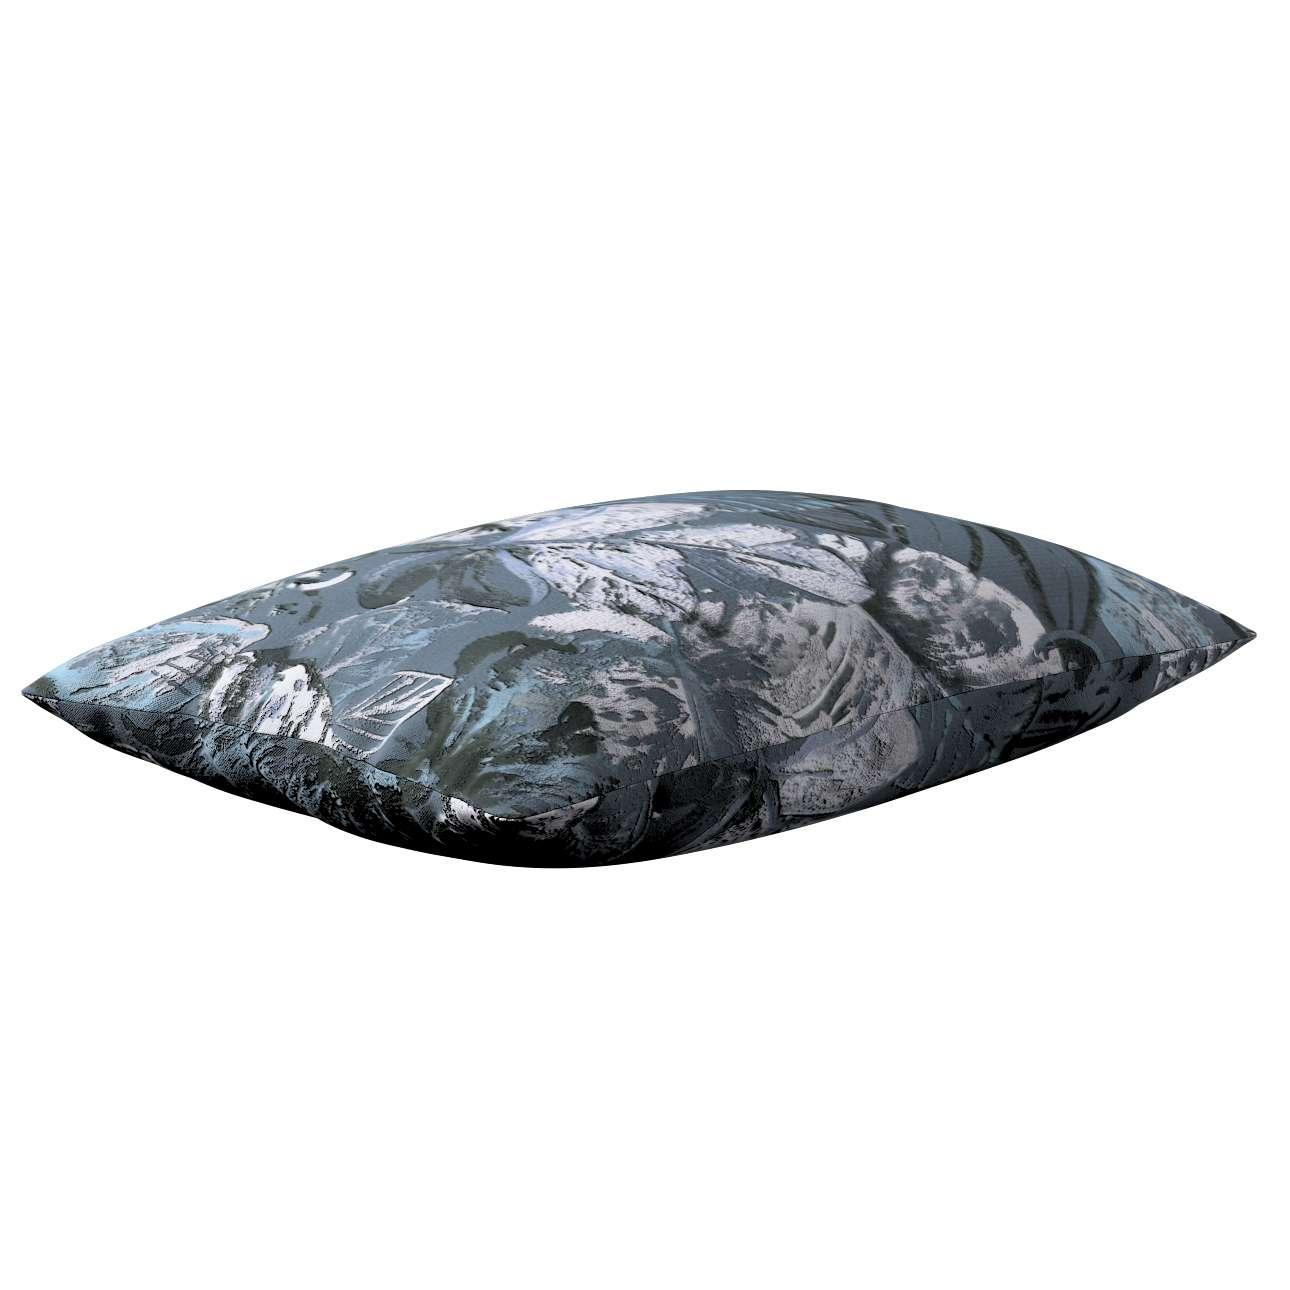 Kinga - potah na polštář jednoduchý obdélníkový v kolekci Abigail, látka: 143-18